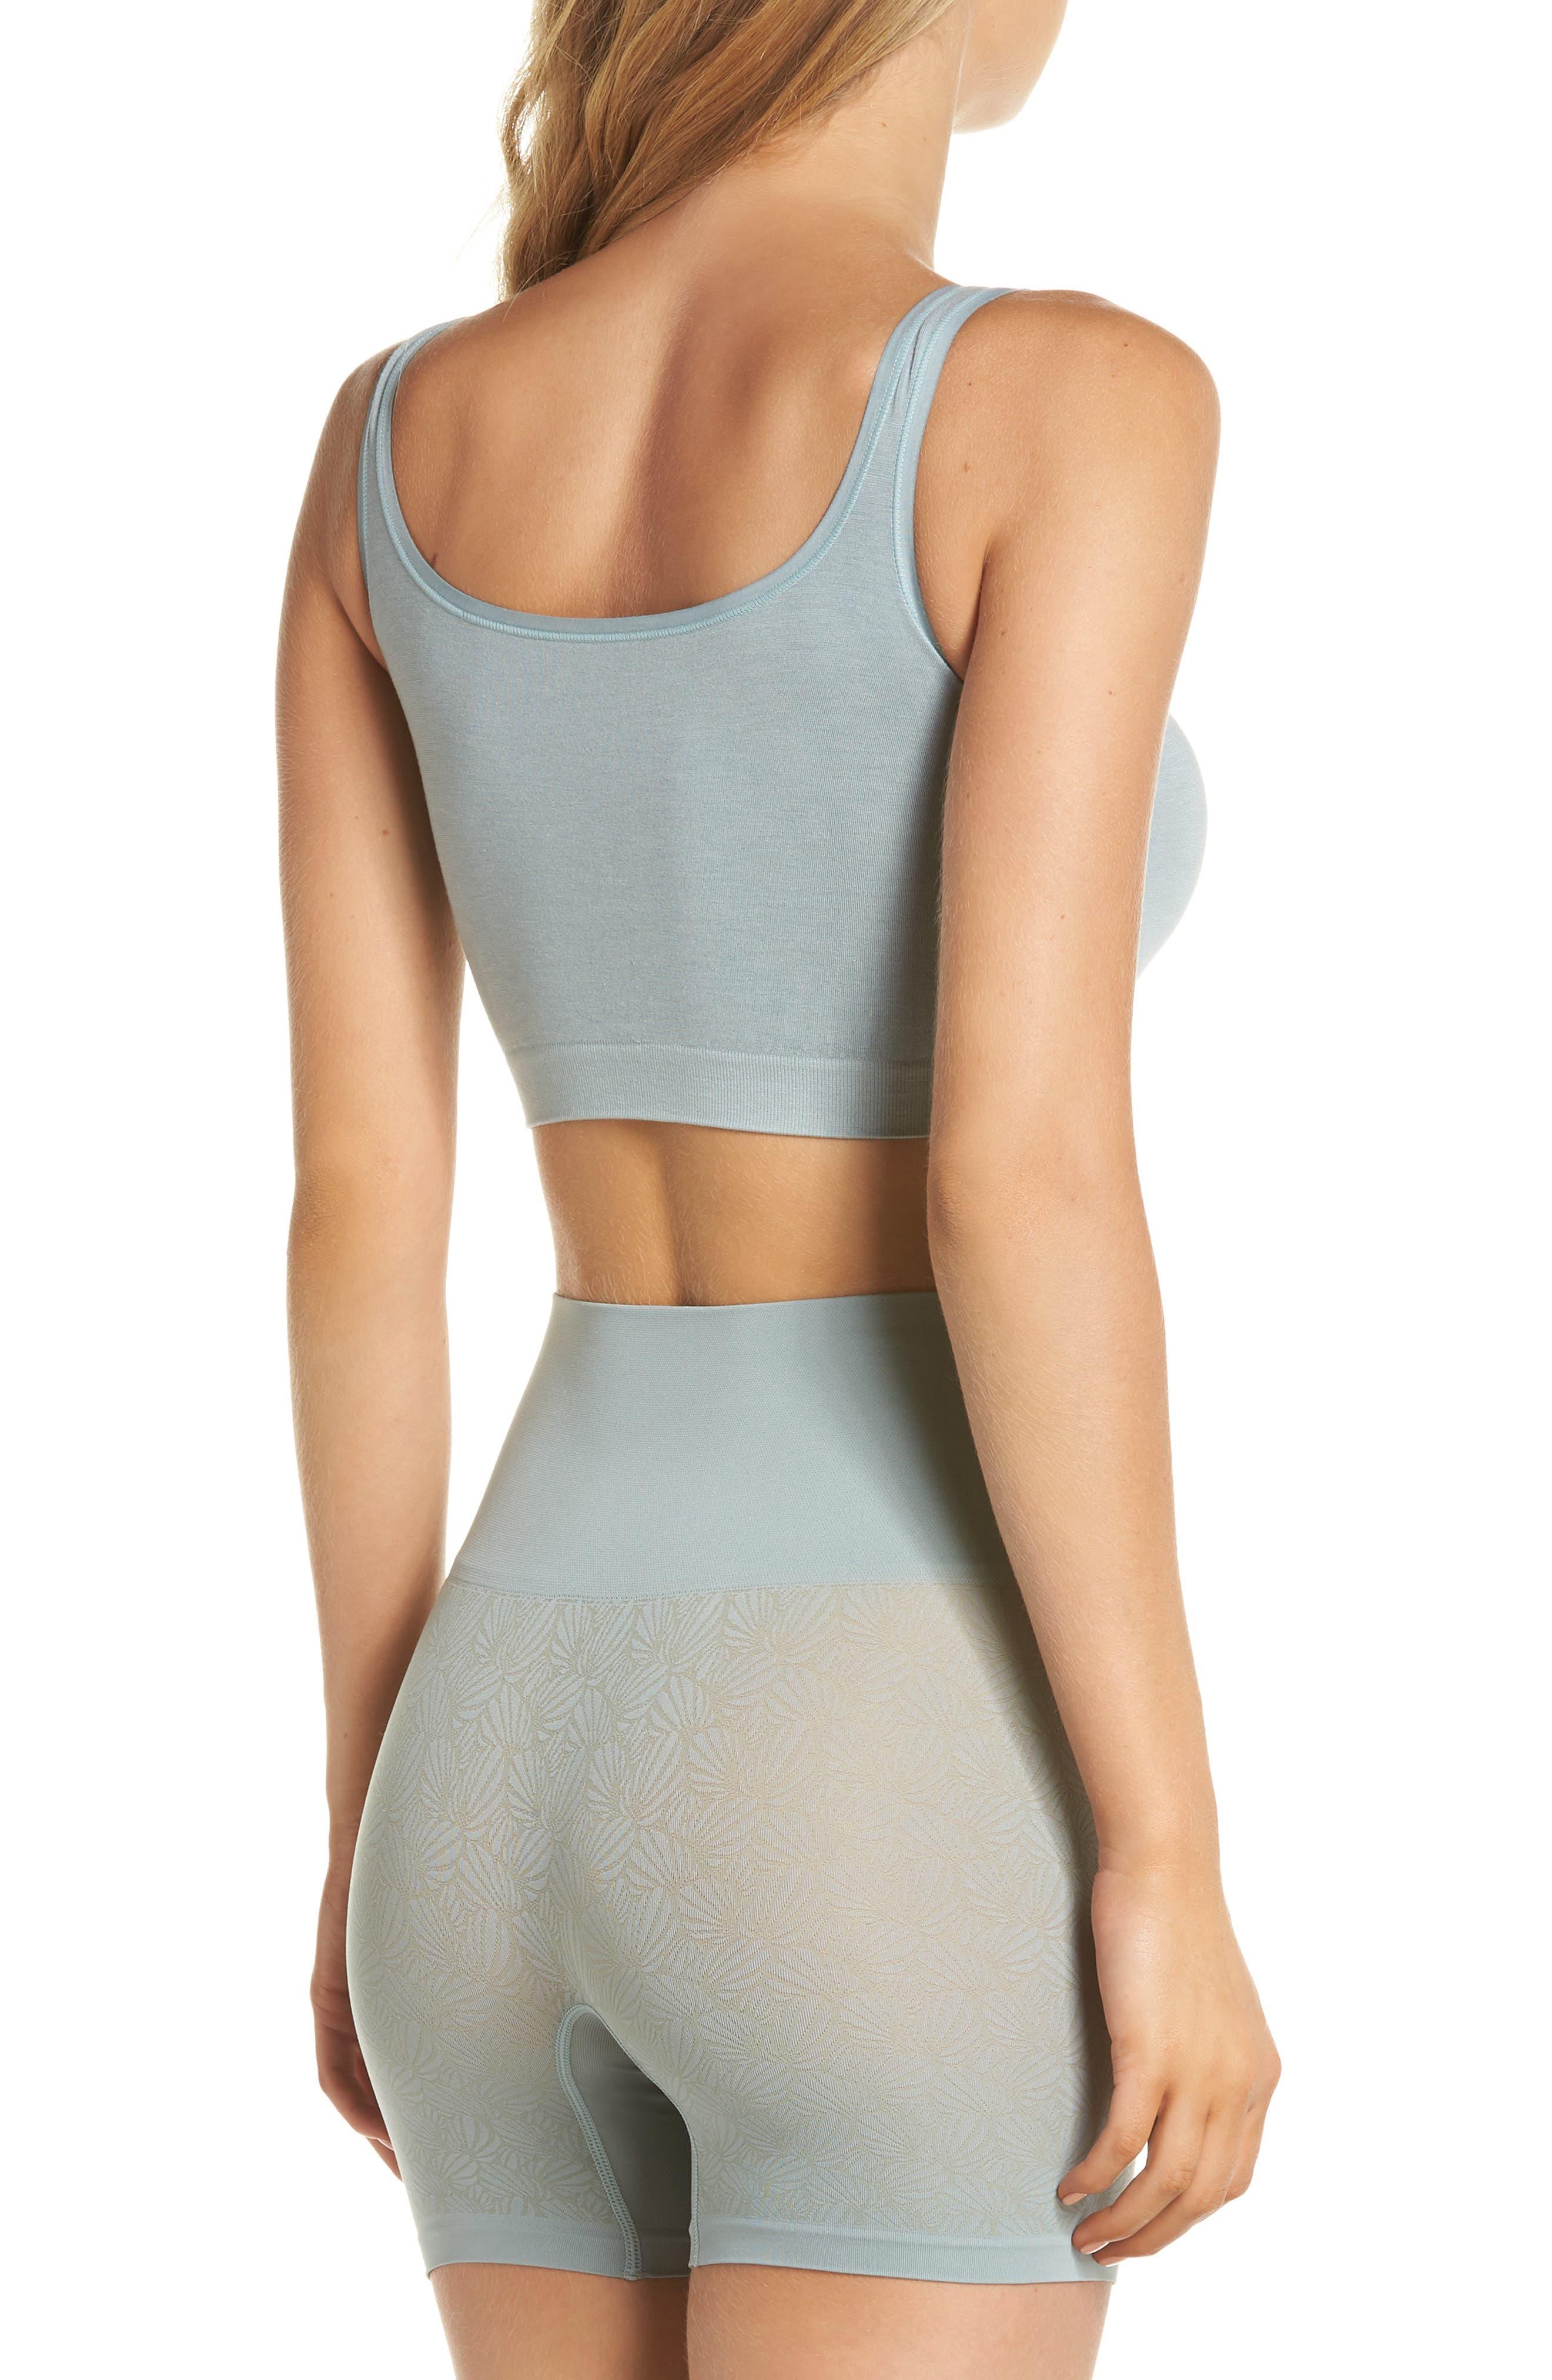 Ultralight Seamless Shaping Shorts,                             Alternate thumbnail 8, color,                             SILVER BLUE